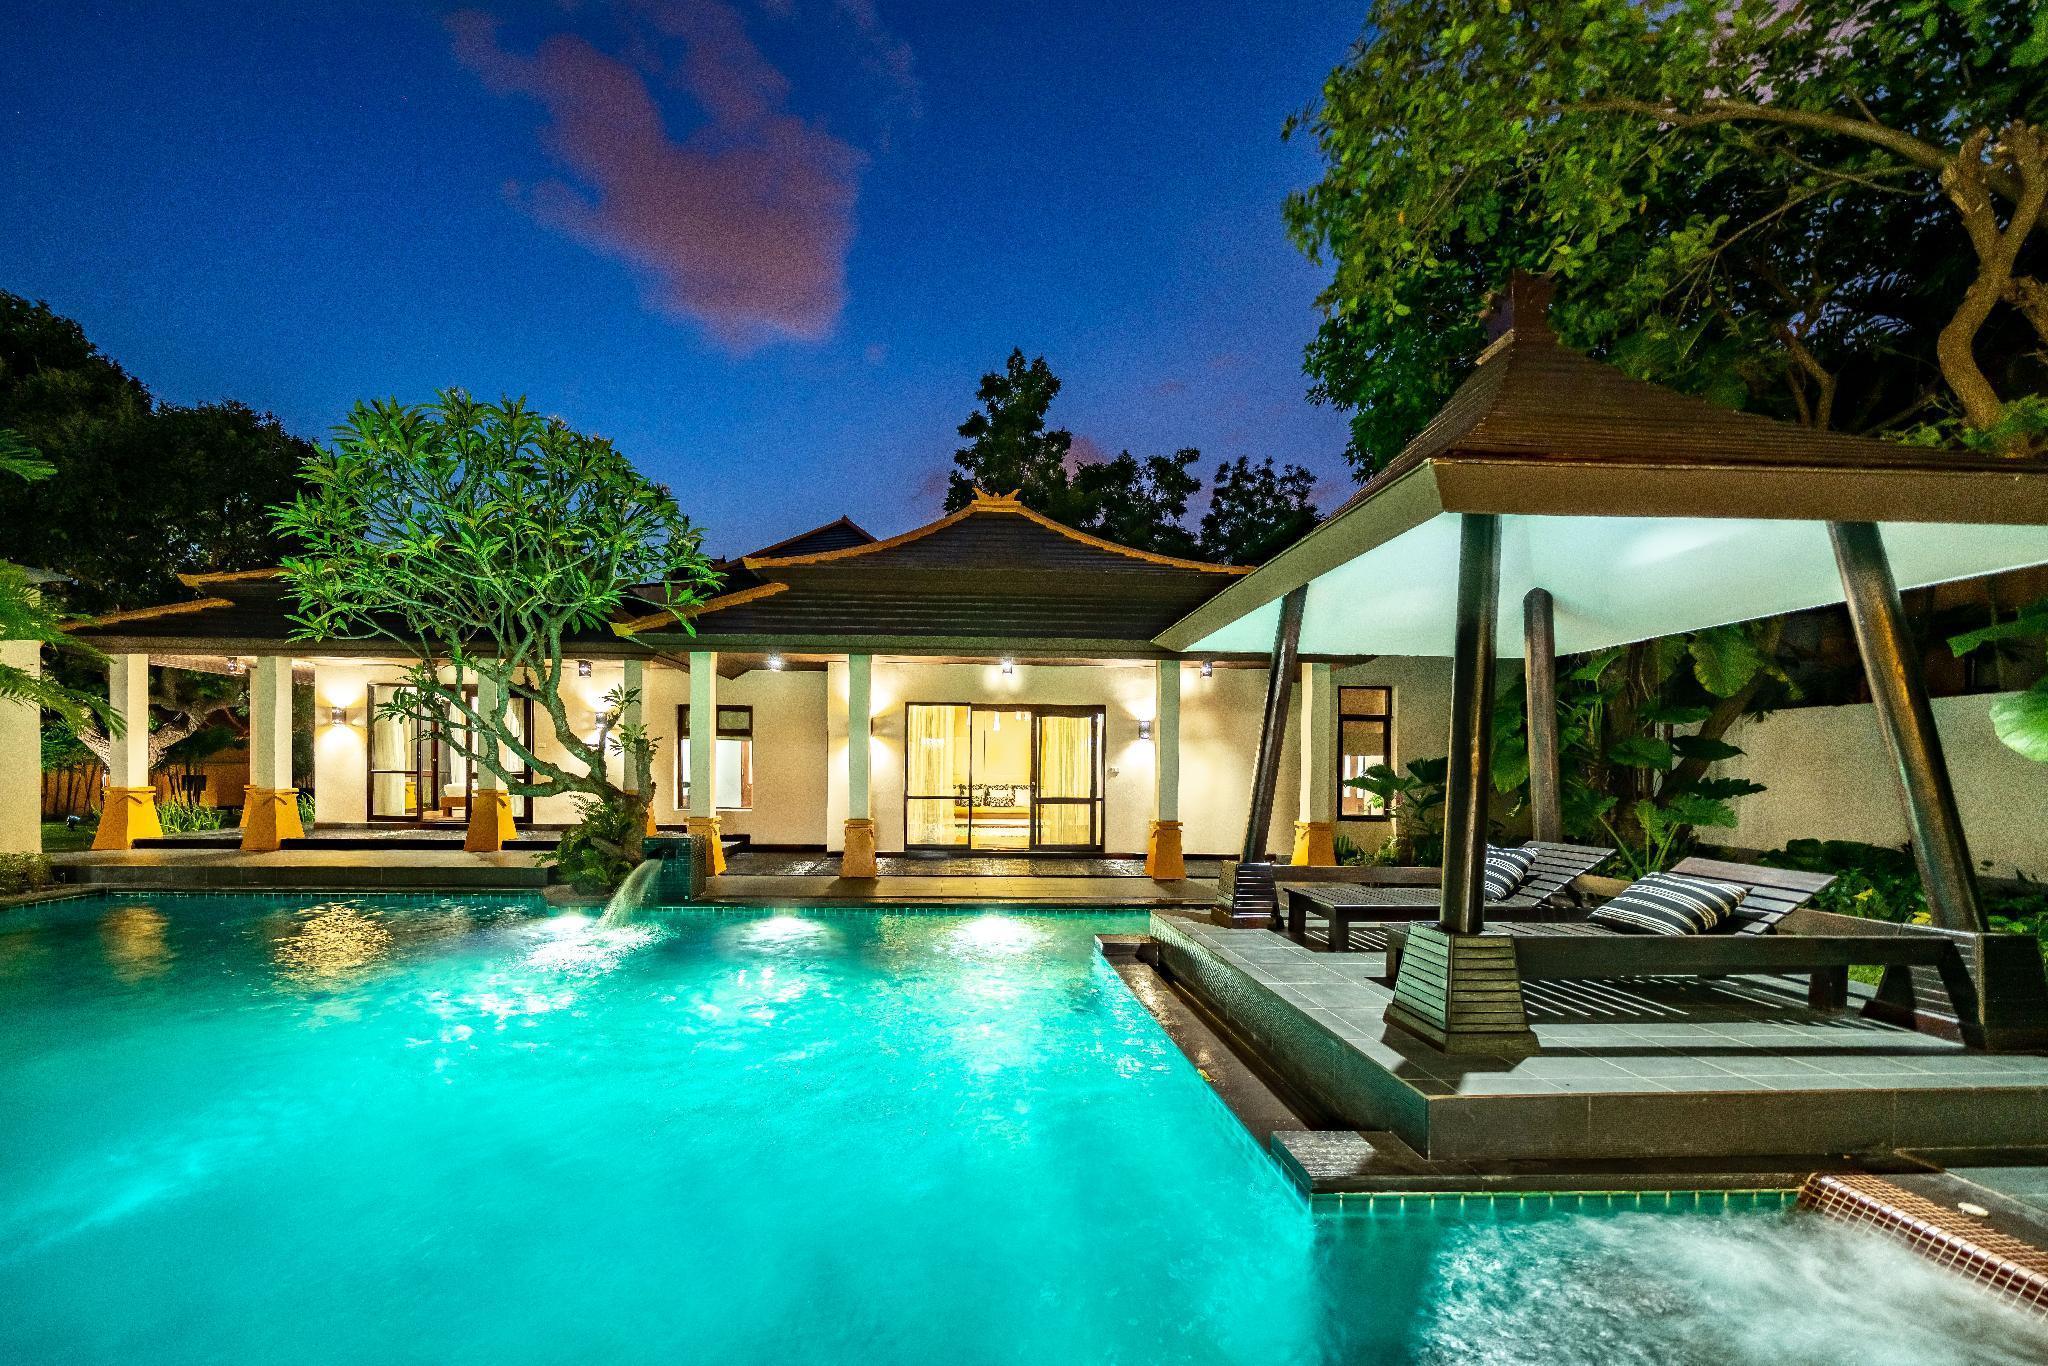 Phutara Villa Pattaya No.16 วิลลา 5 ห้องนอน 5 ห้องน้ำส่วนตัว ขนาด 1230 ตร.ม. – มาบประชันเรเซอเวอร์